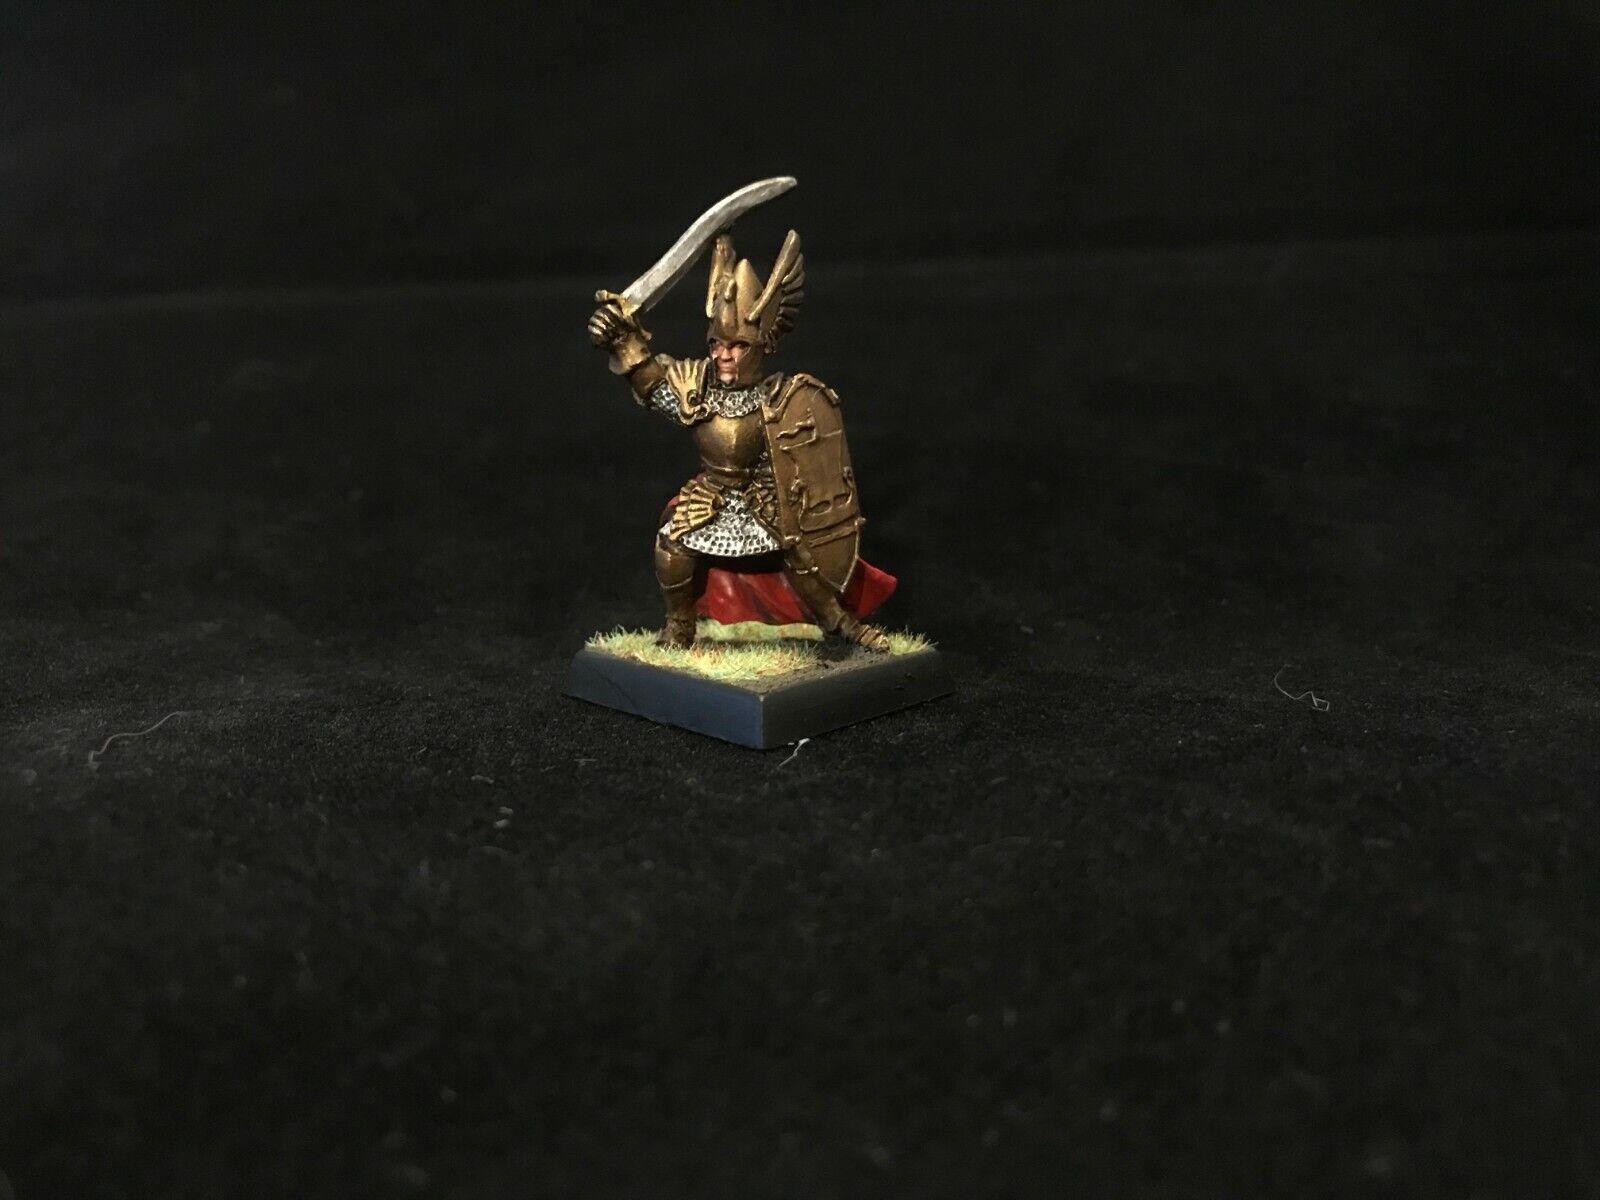 Painted Reaper Miniature Elf D&D Pathfinder Fantasy RPG Tabletop 28mm